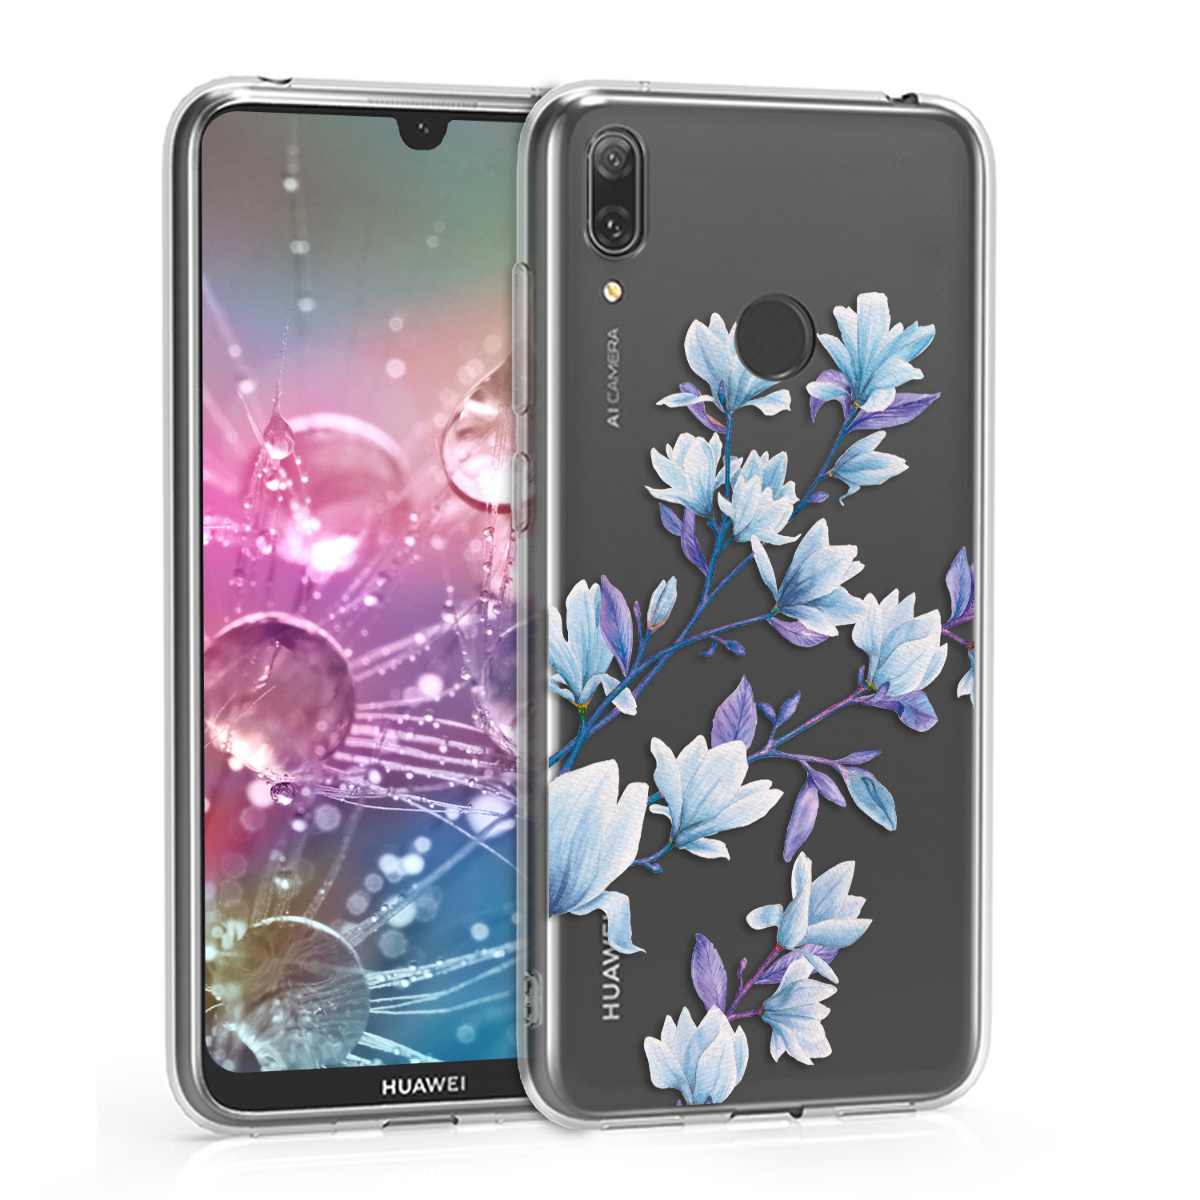 KW Θήκη Σιλικόνης Huawei Y7 2019 / Y7 Prime 2019 - Blue / Violet / Transparent (47659.14)